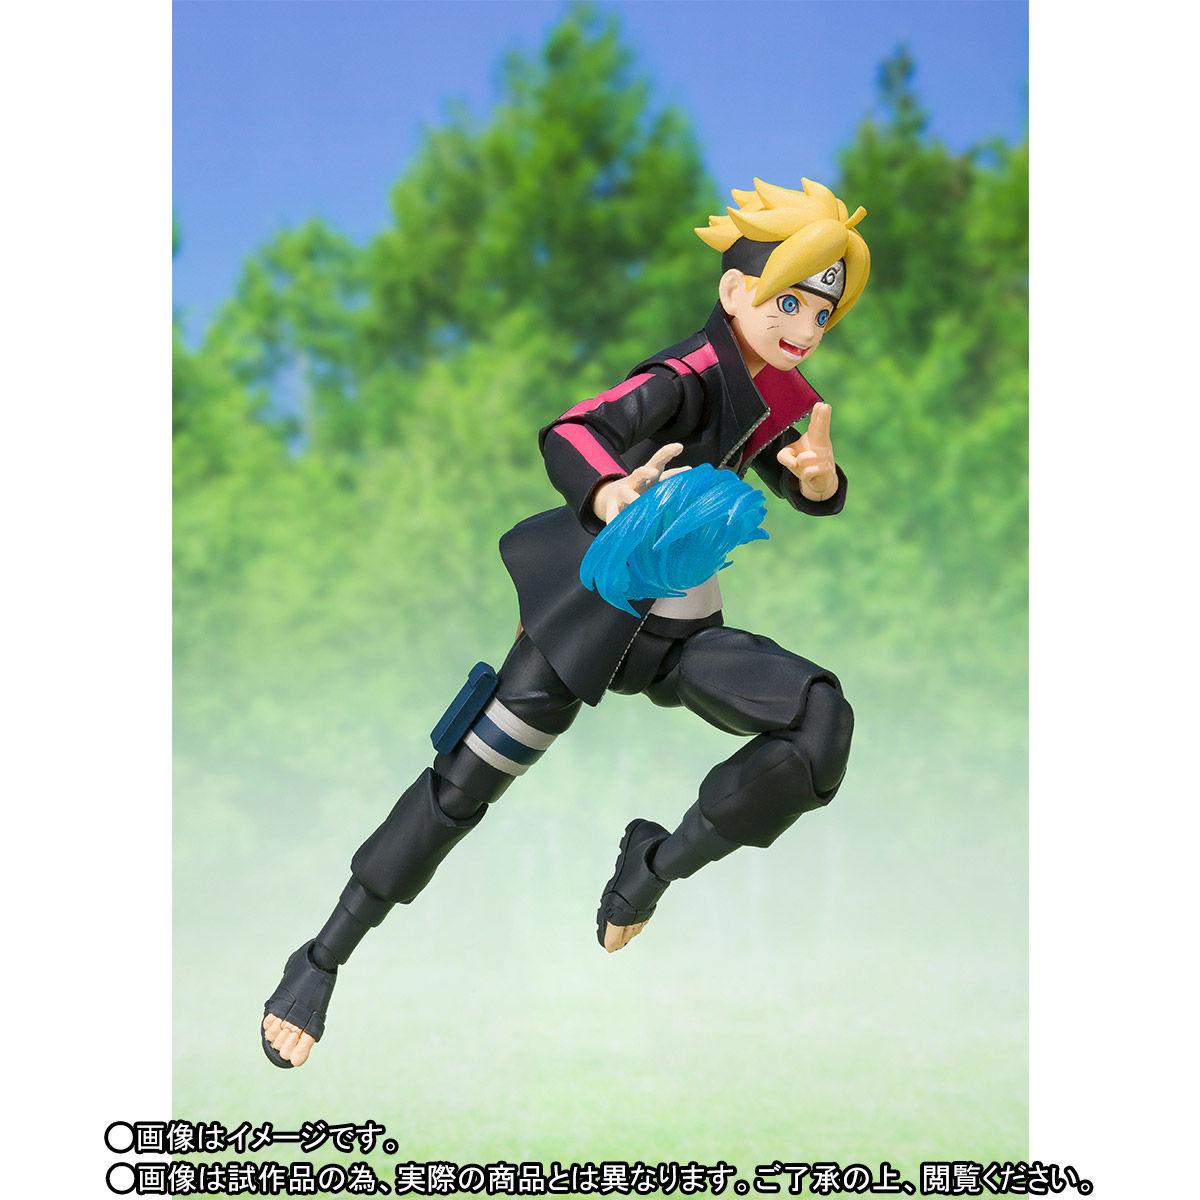 Link a Boruto Uzumaki SH Figuarts Bandai pre 04